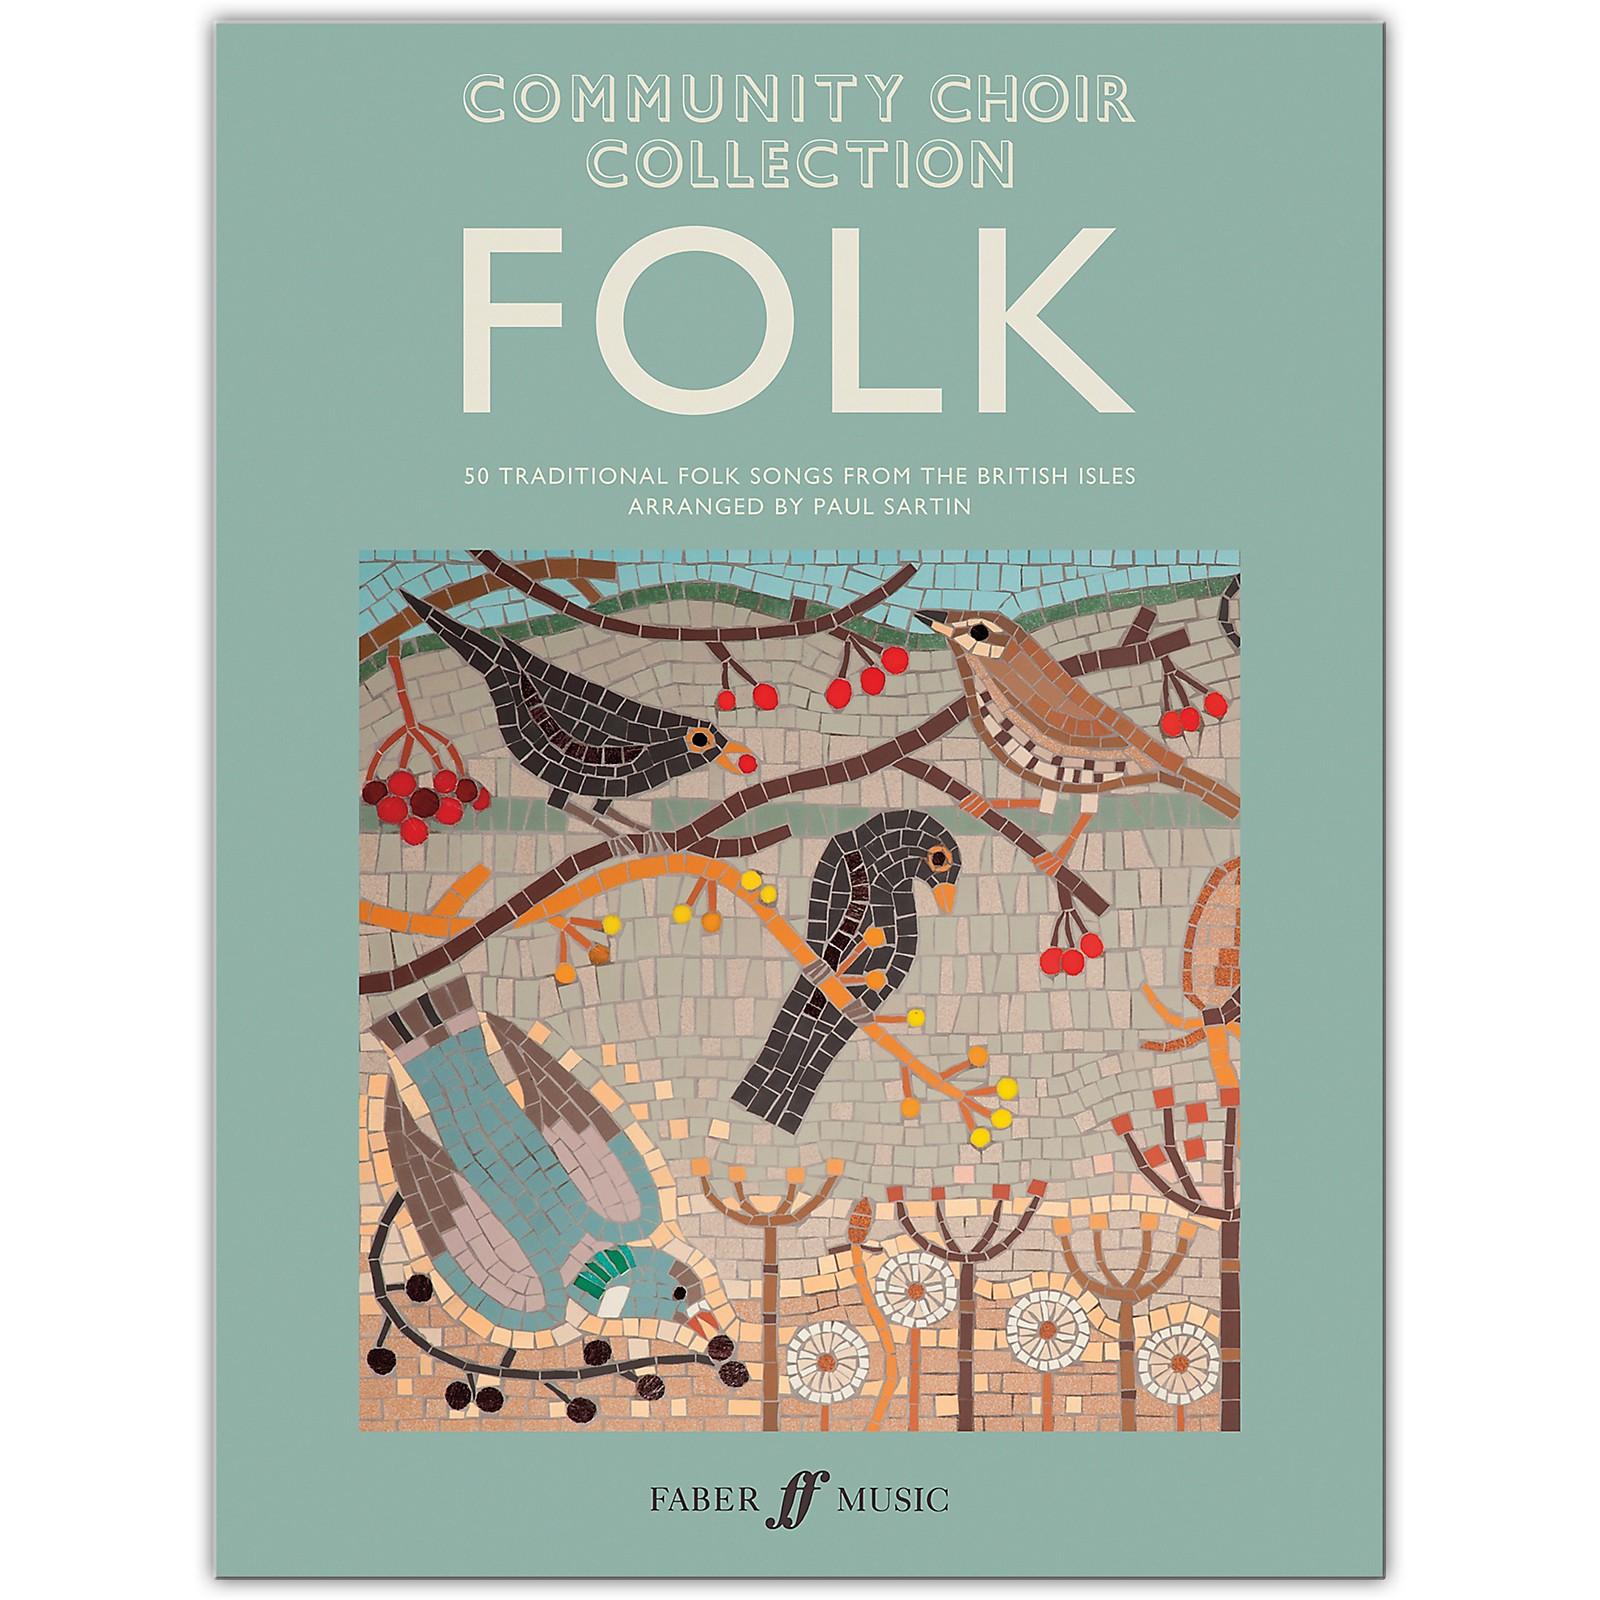 Faber Music LTD Community Choir Collection: Folk Mixed Voices